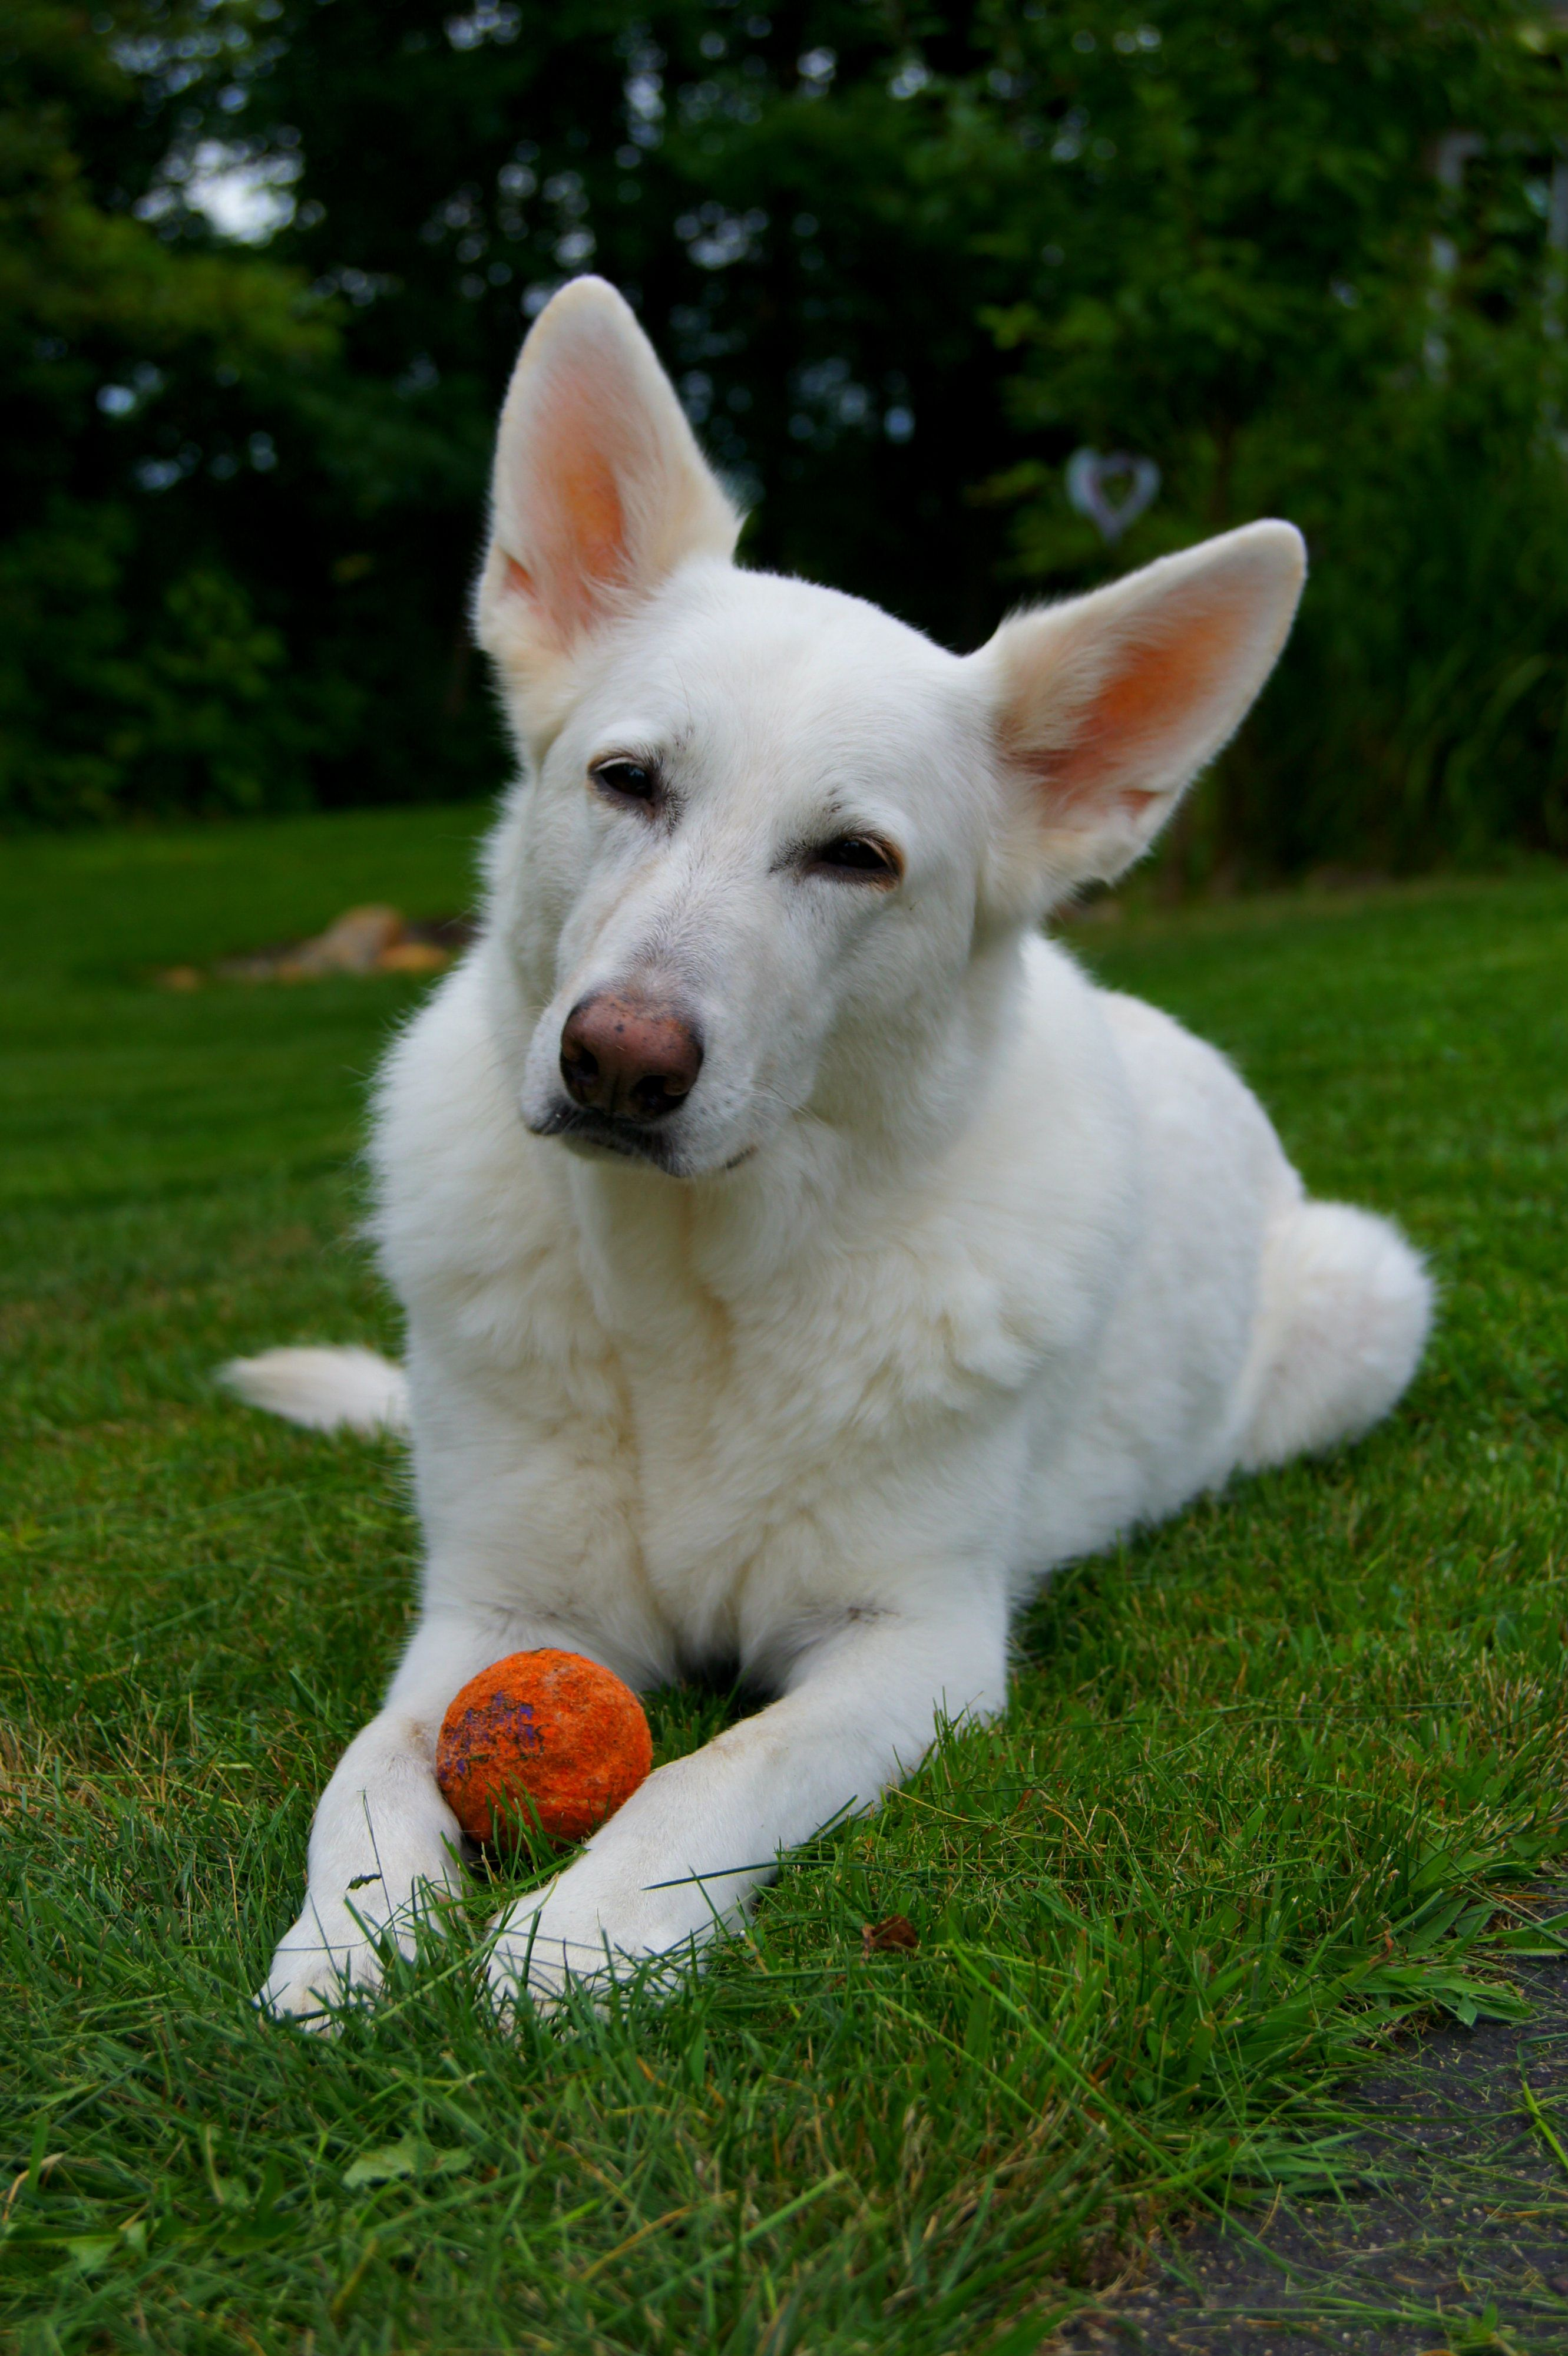 Our Girl Echo Ukc Alch Wgsdca Alch Wgsdci Alch Odyssey S Enchanted Echo Cgc German Shepherd Puppies White German Shepherd White German Shephard